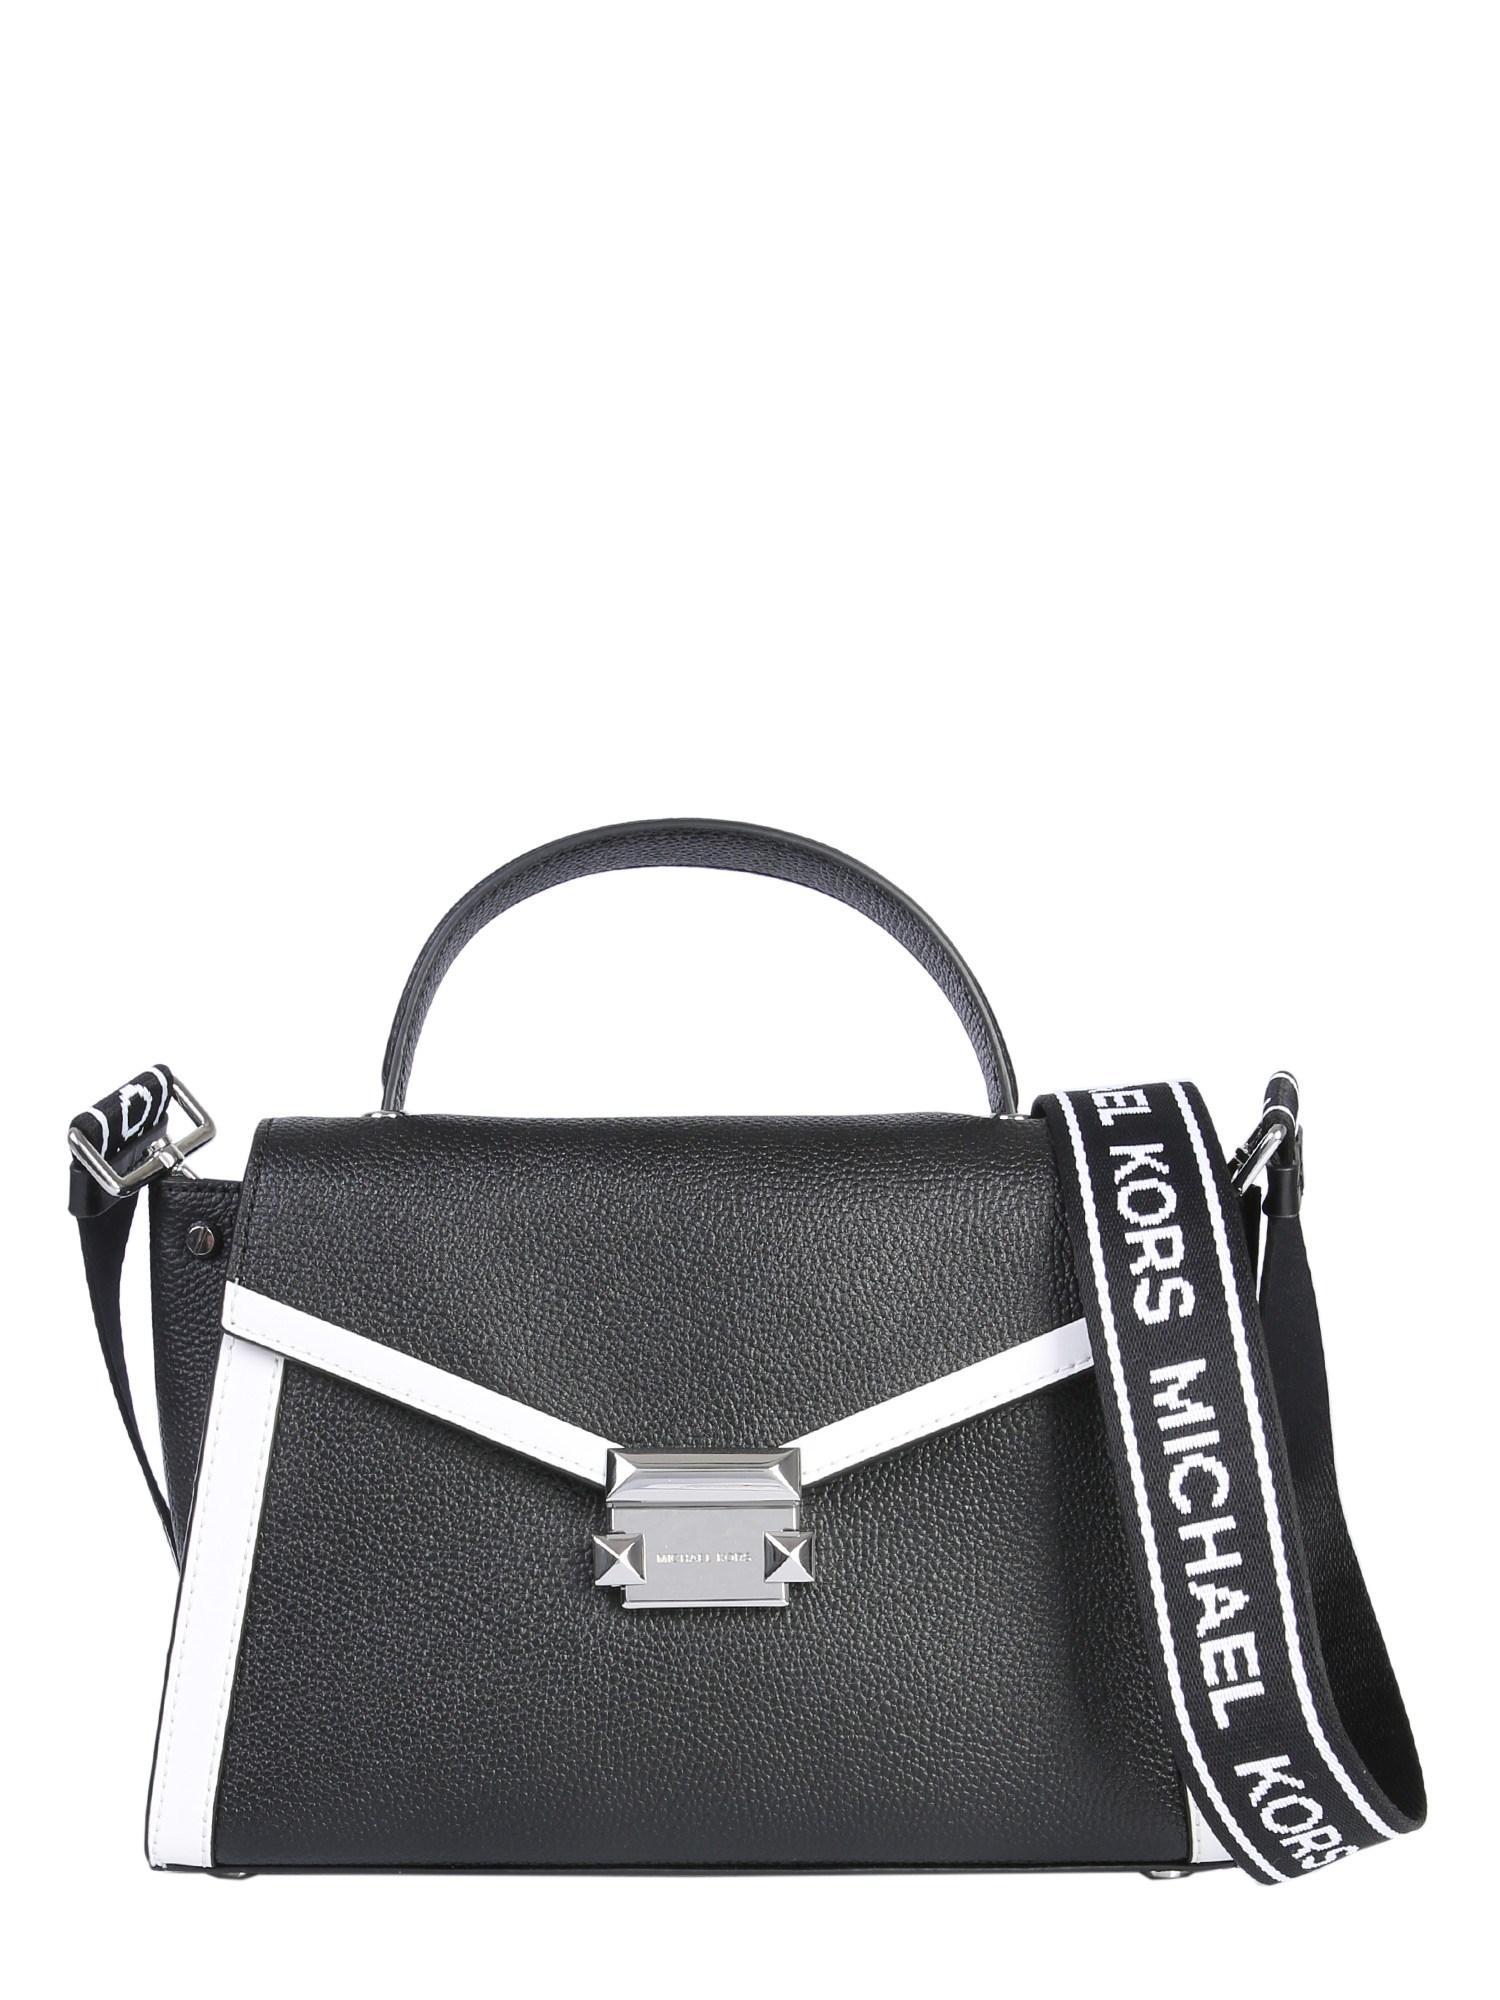 4d5a04320a MICHAEL Michael Kors Medium Whitney Leather Handbag in Black - Lyst